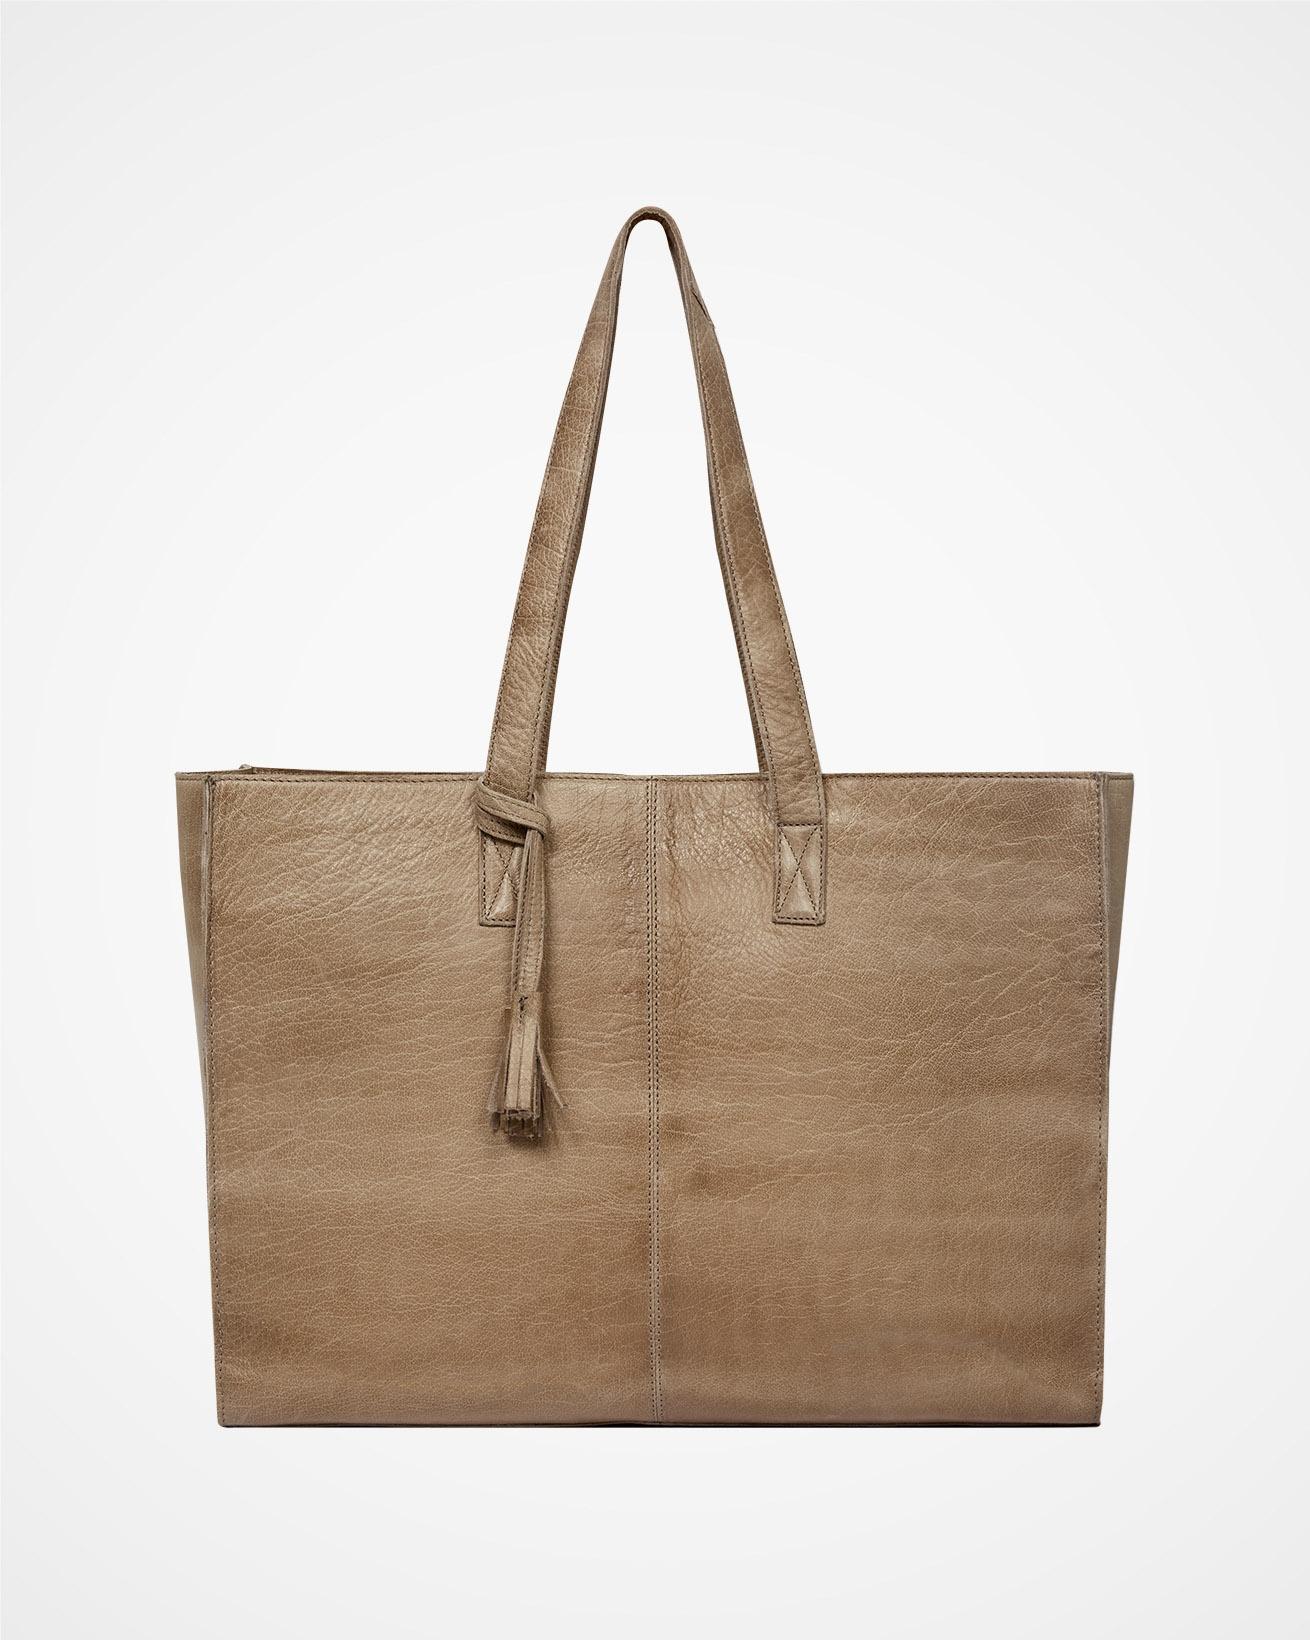 7883_leather-shopper-bag_camel_back_cutout_web.jpg